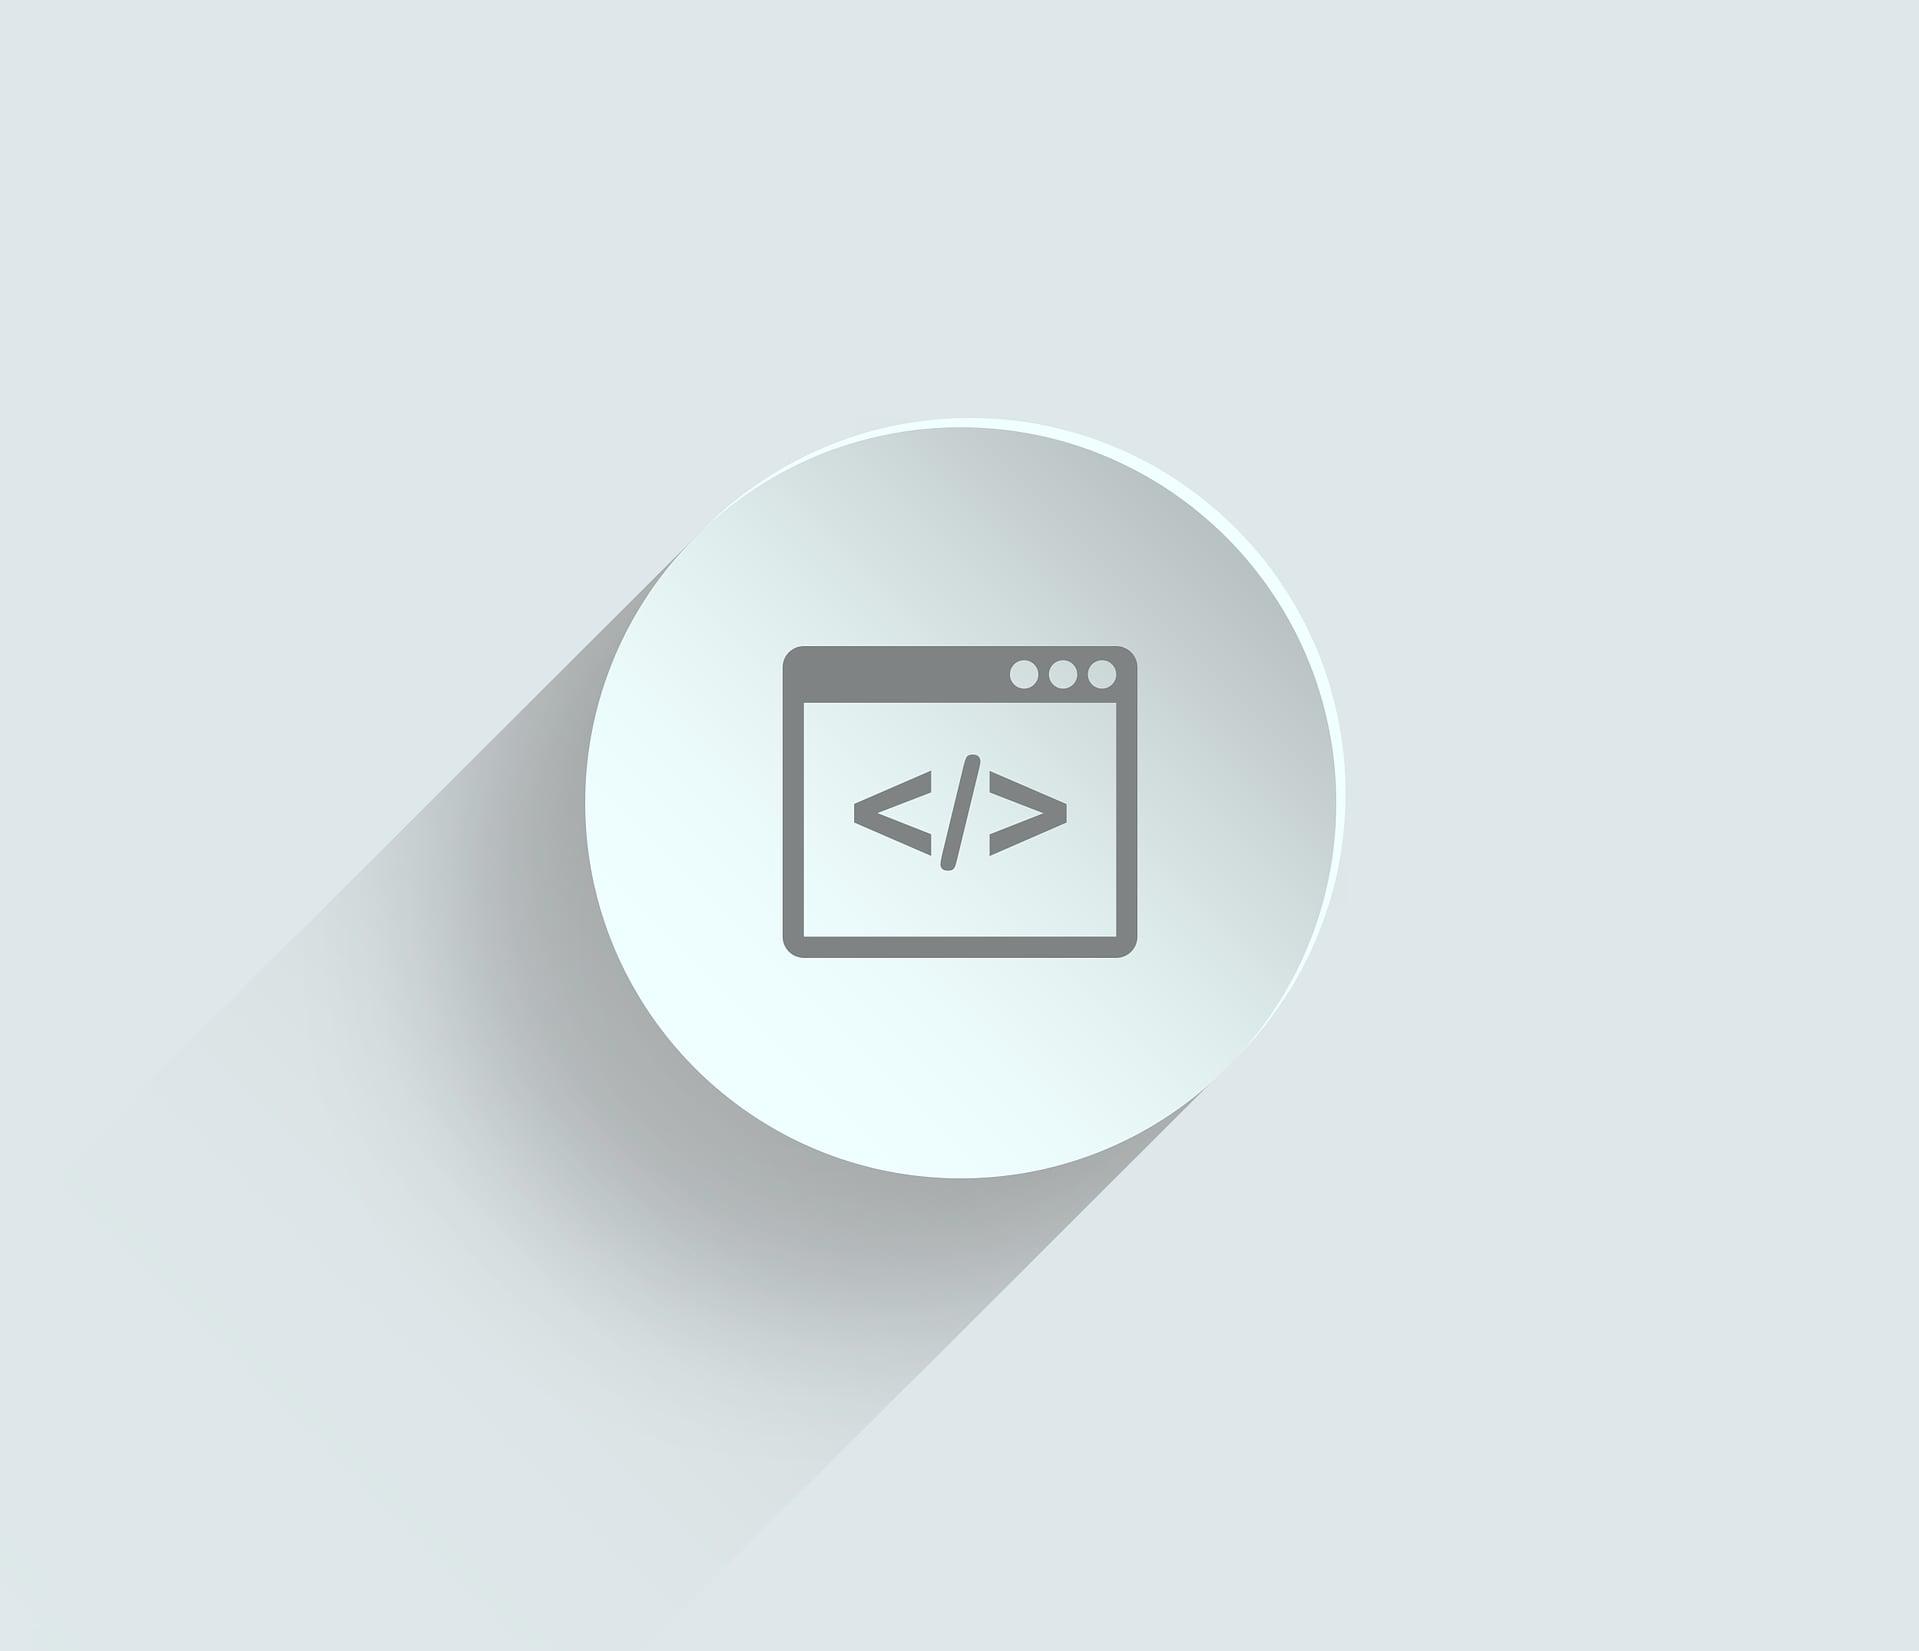 bsnl-broadband-modem-settings-for-tp-link